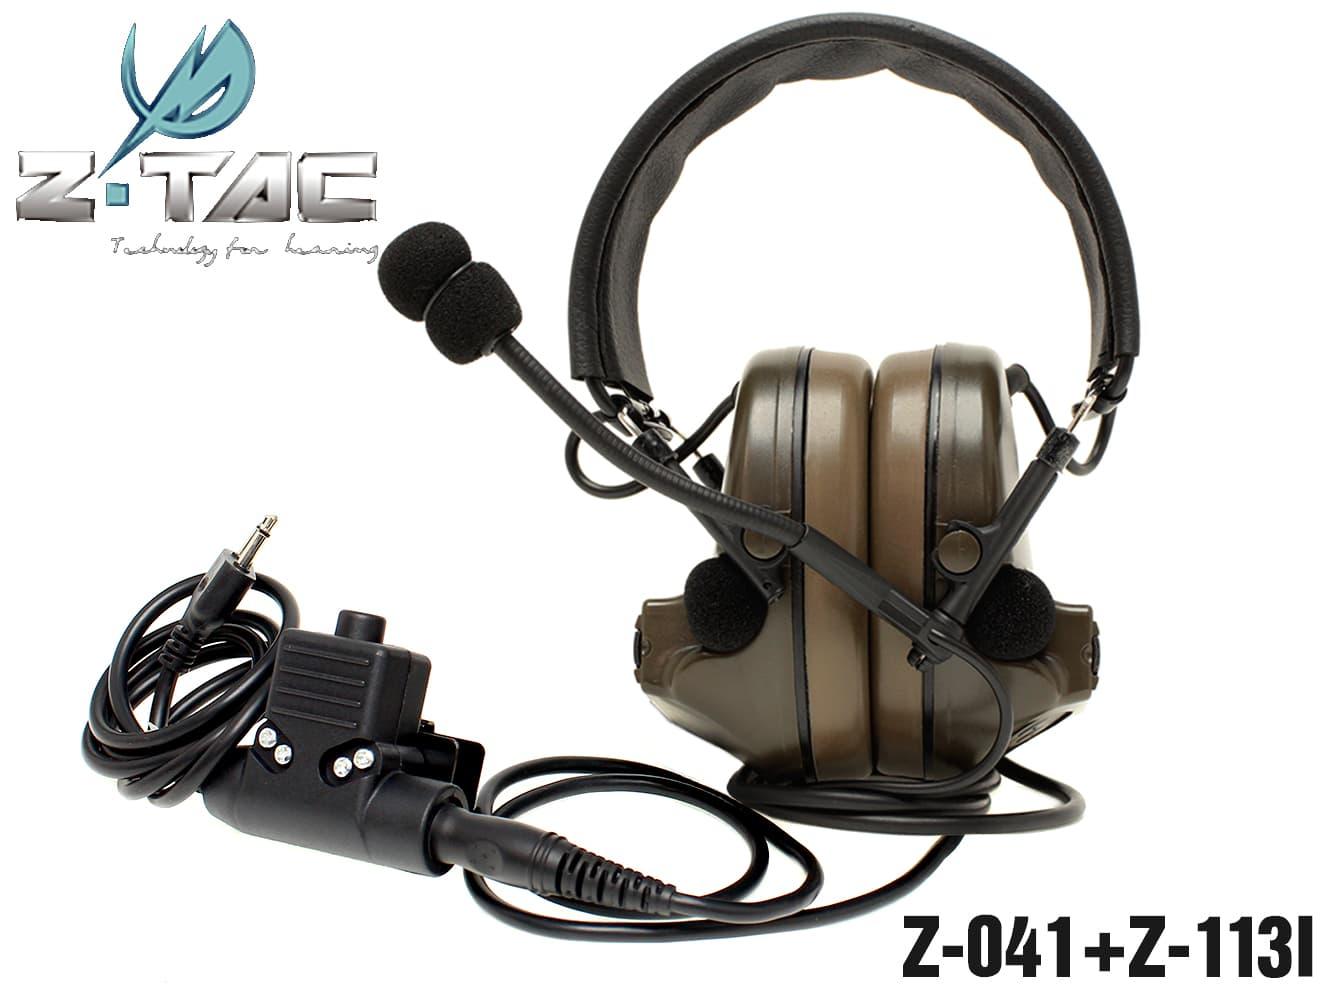 Z-TACTICAL COMTAC2ヘッドセット+ICOM用U94タイプPTTスイッチ セット◆ICOMトランシーバーとセット使用でリアル通信アイテムに!